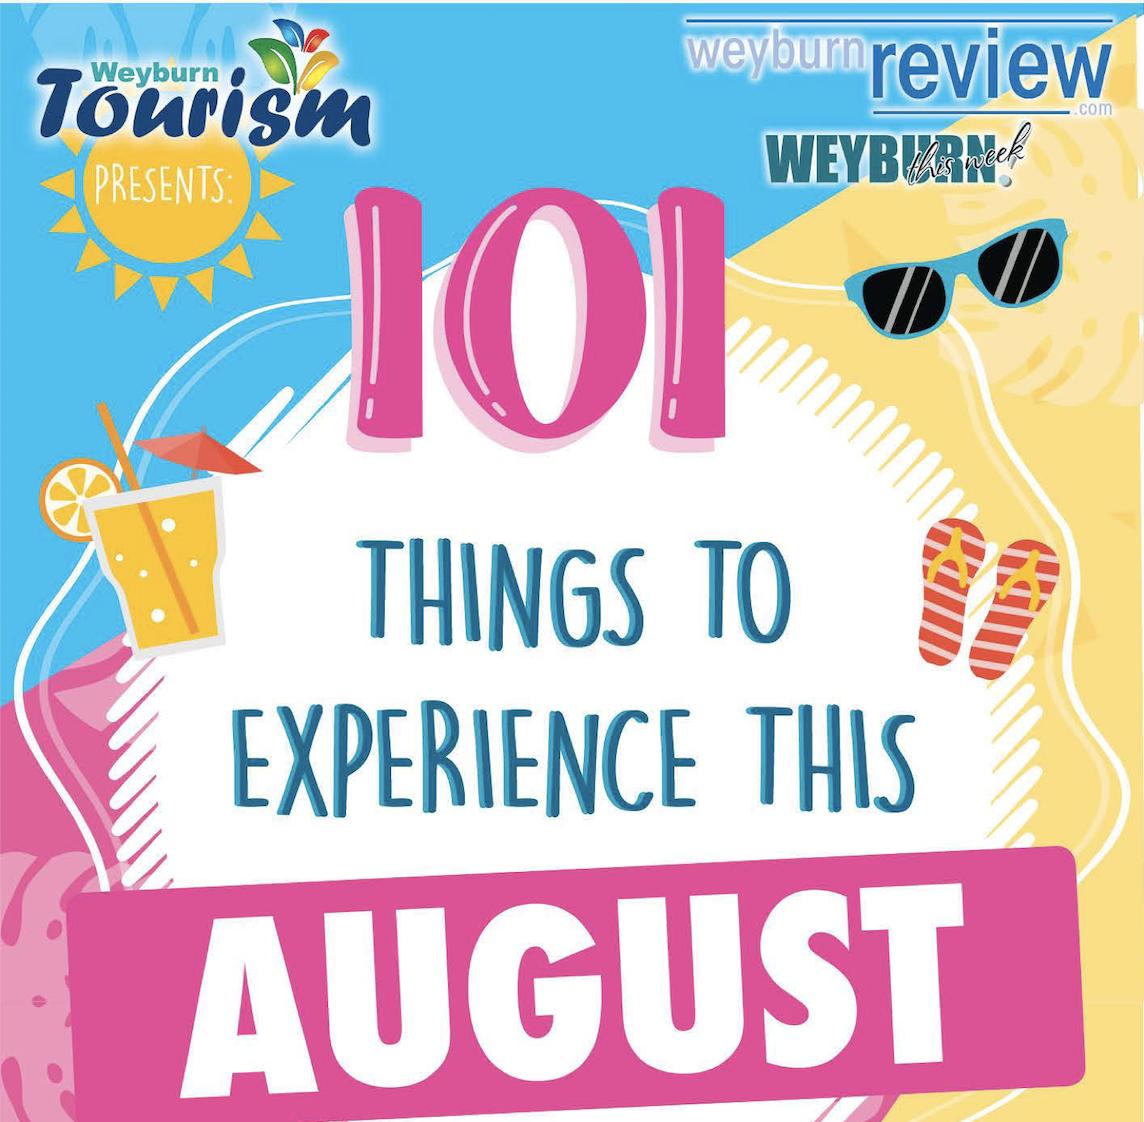 https://weyburntourism.com/wp-content/uploads/2020/08/Screen-Shot-2020-08-17-at-12.10.40-PM.png